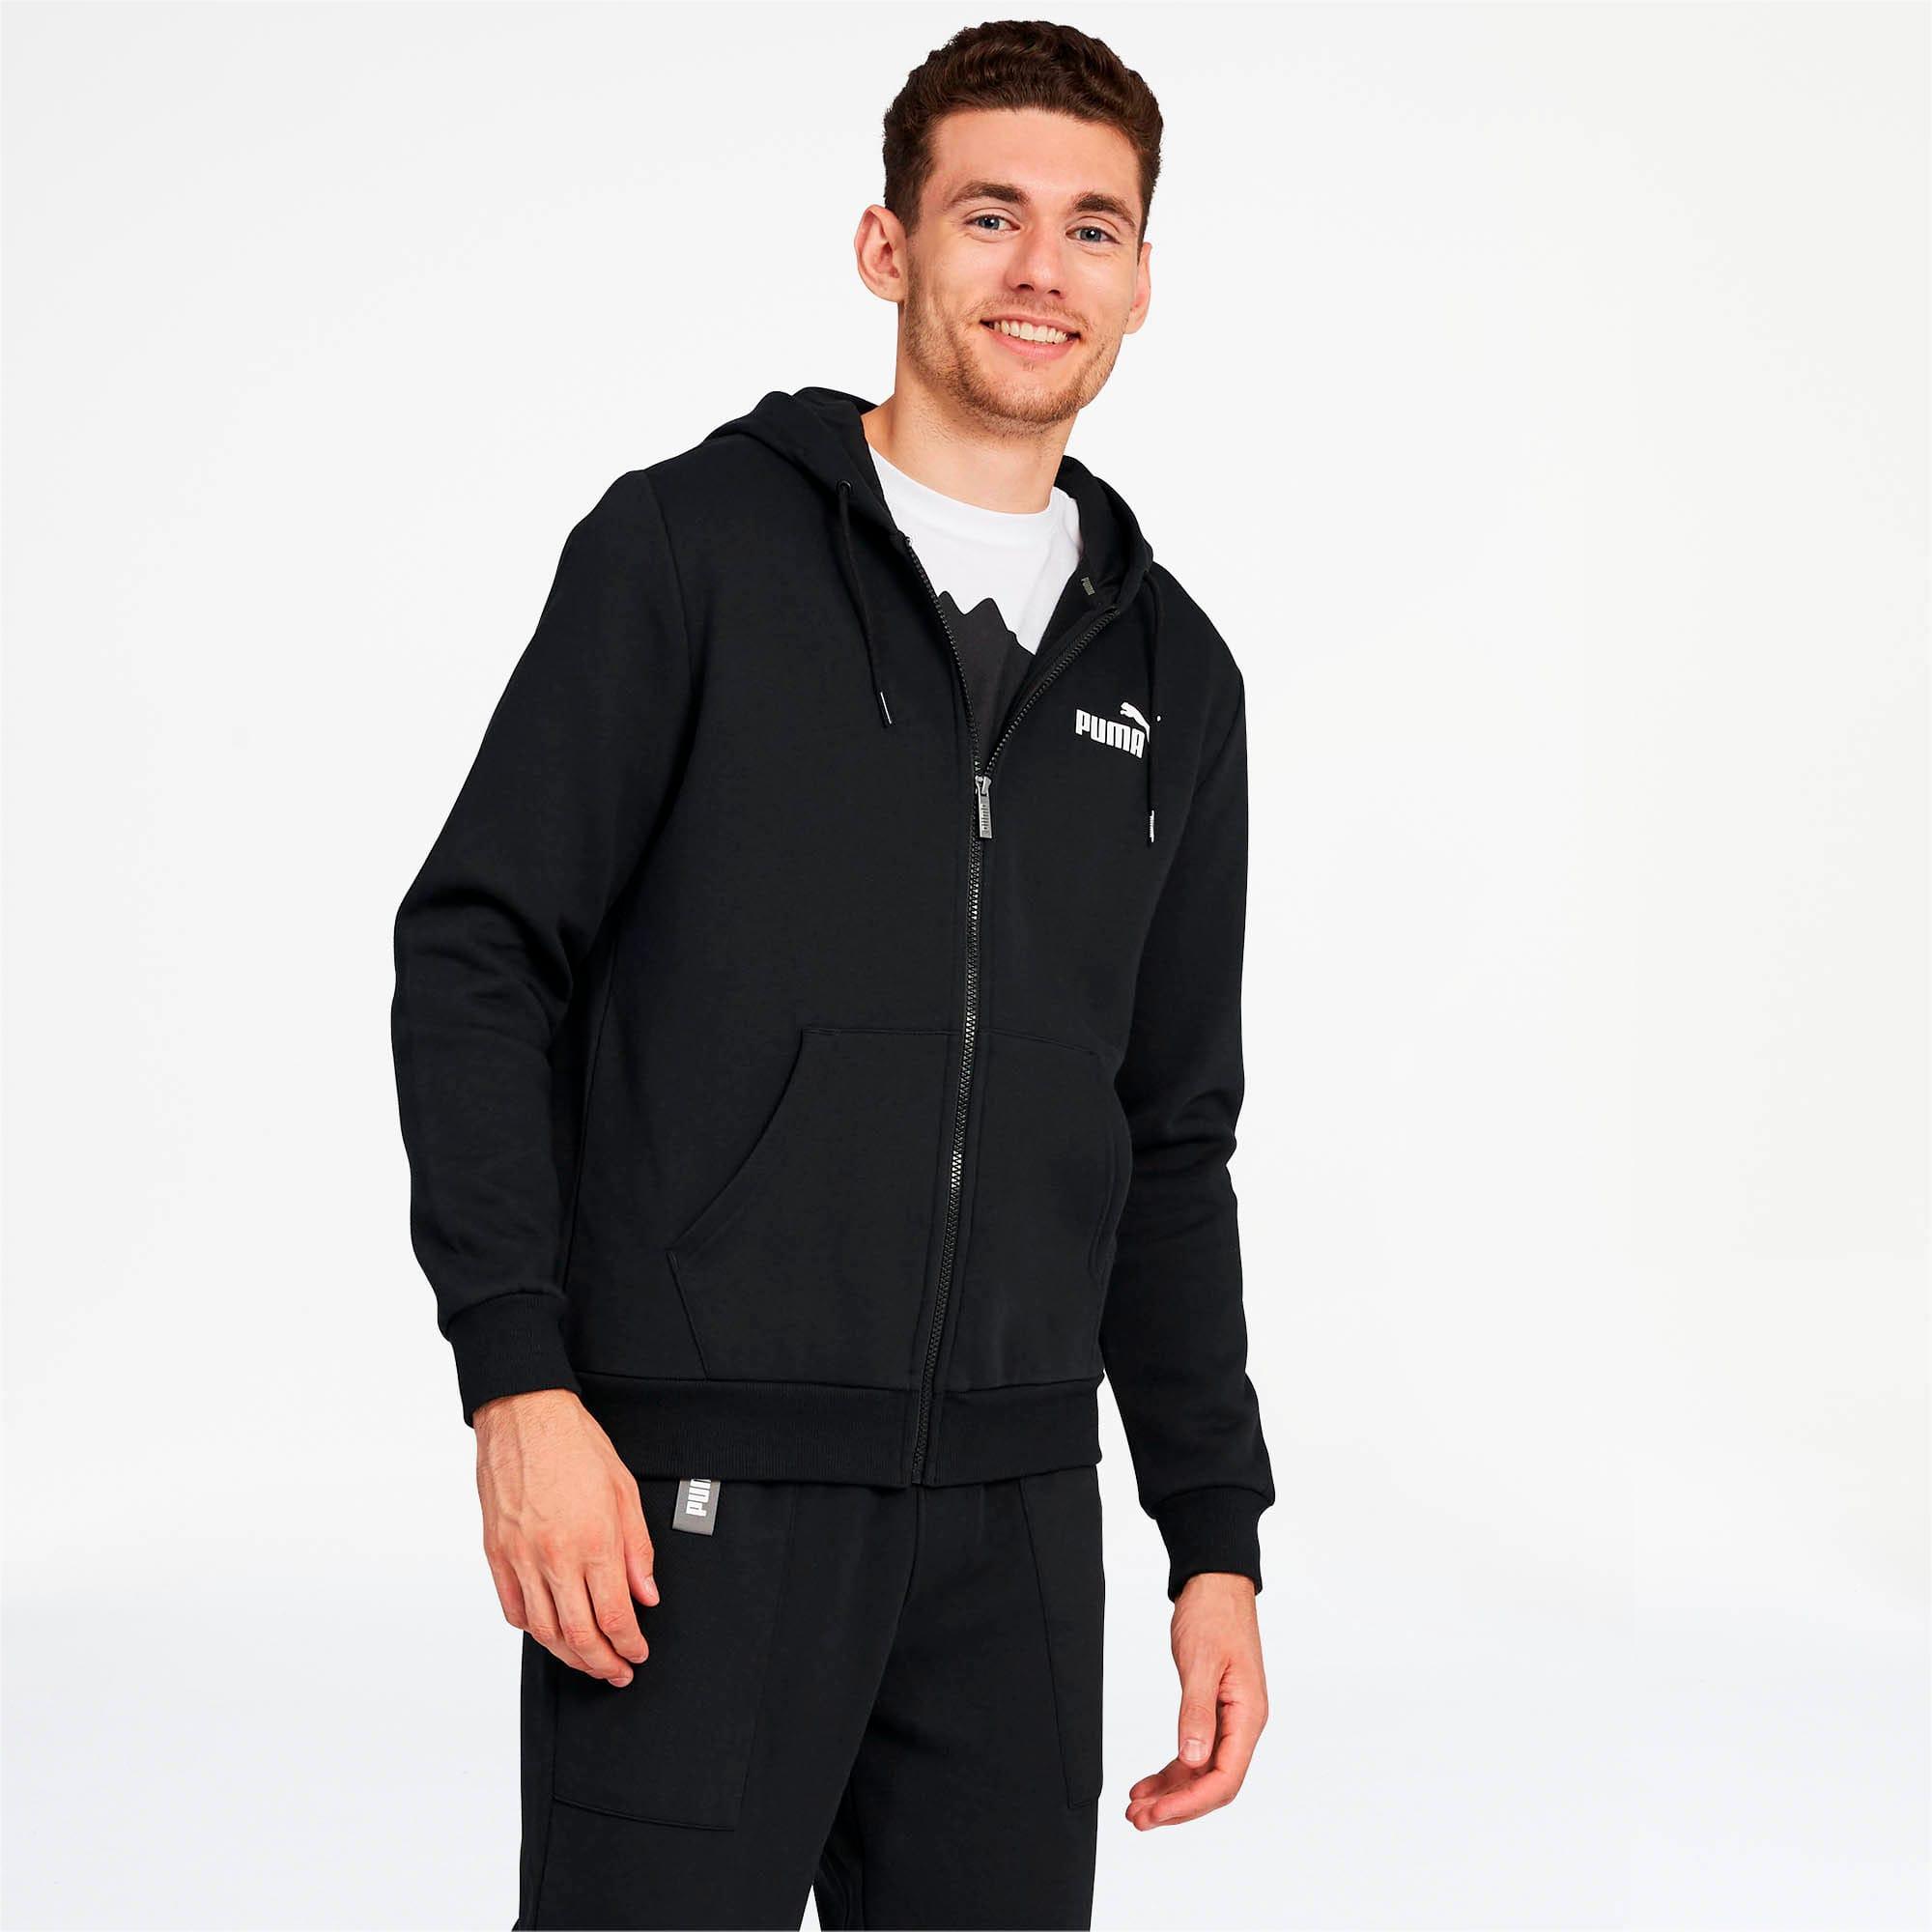 Thumbnail 1 of Essentials Men's Hooded Fleece Jacket, Puma Black, medium